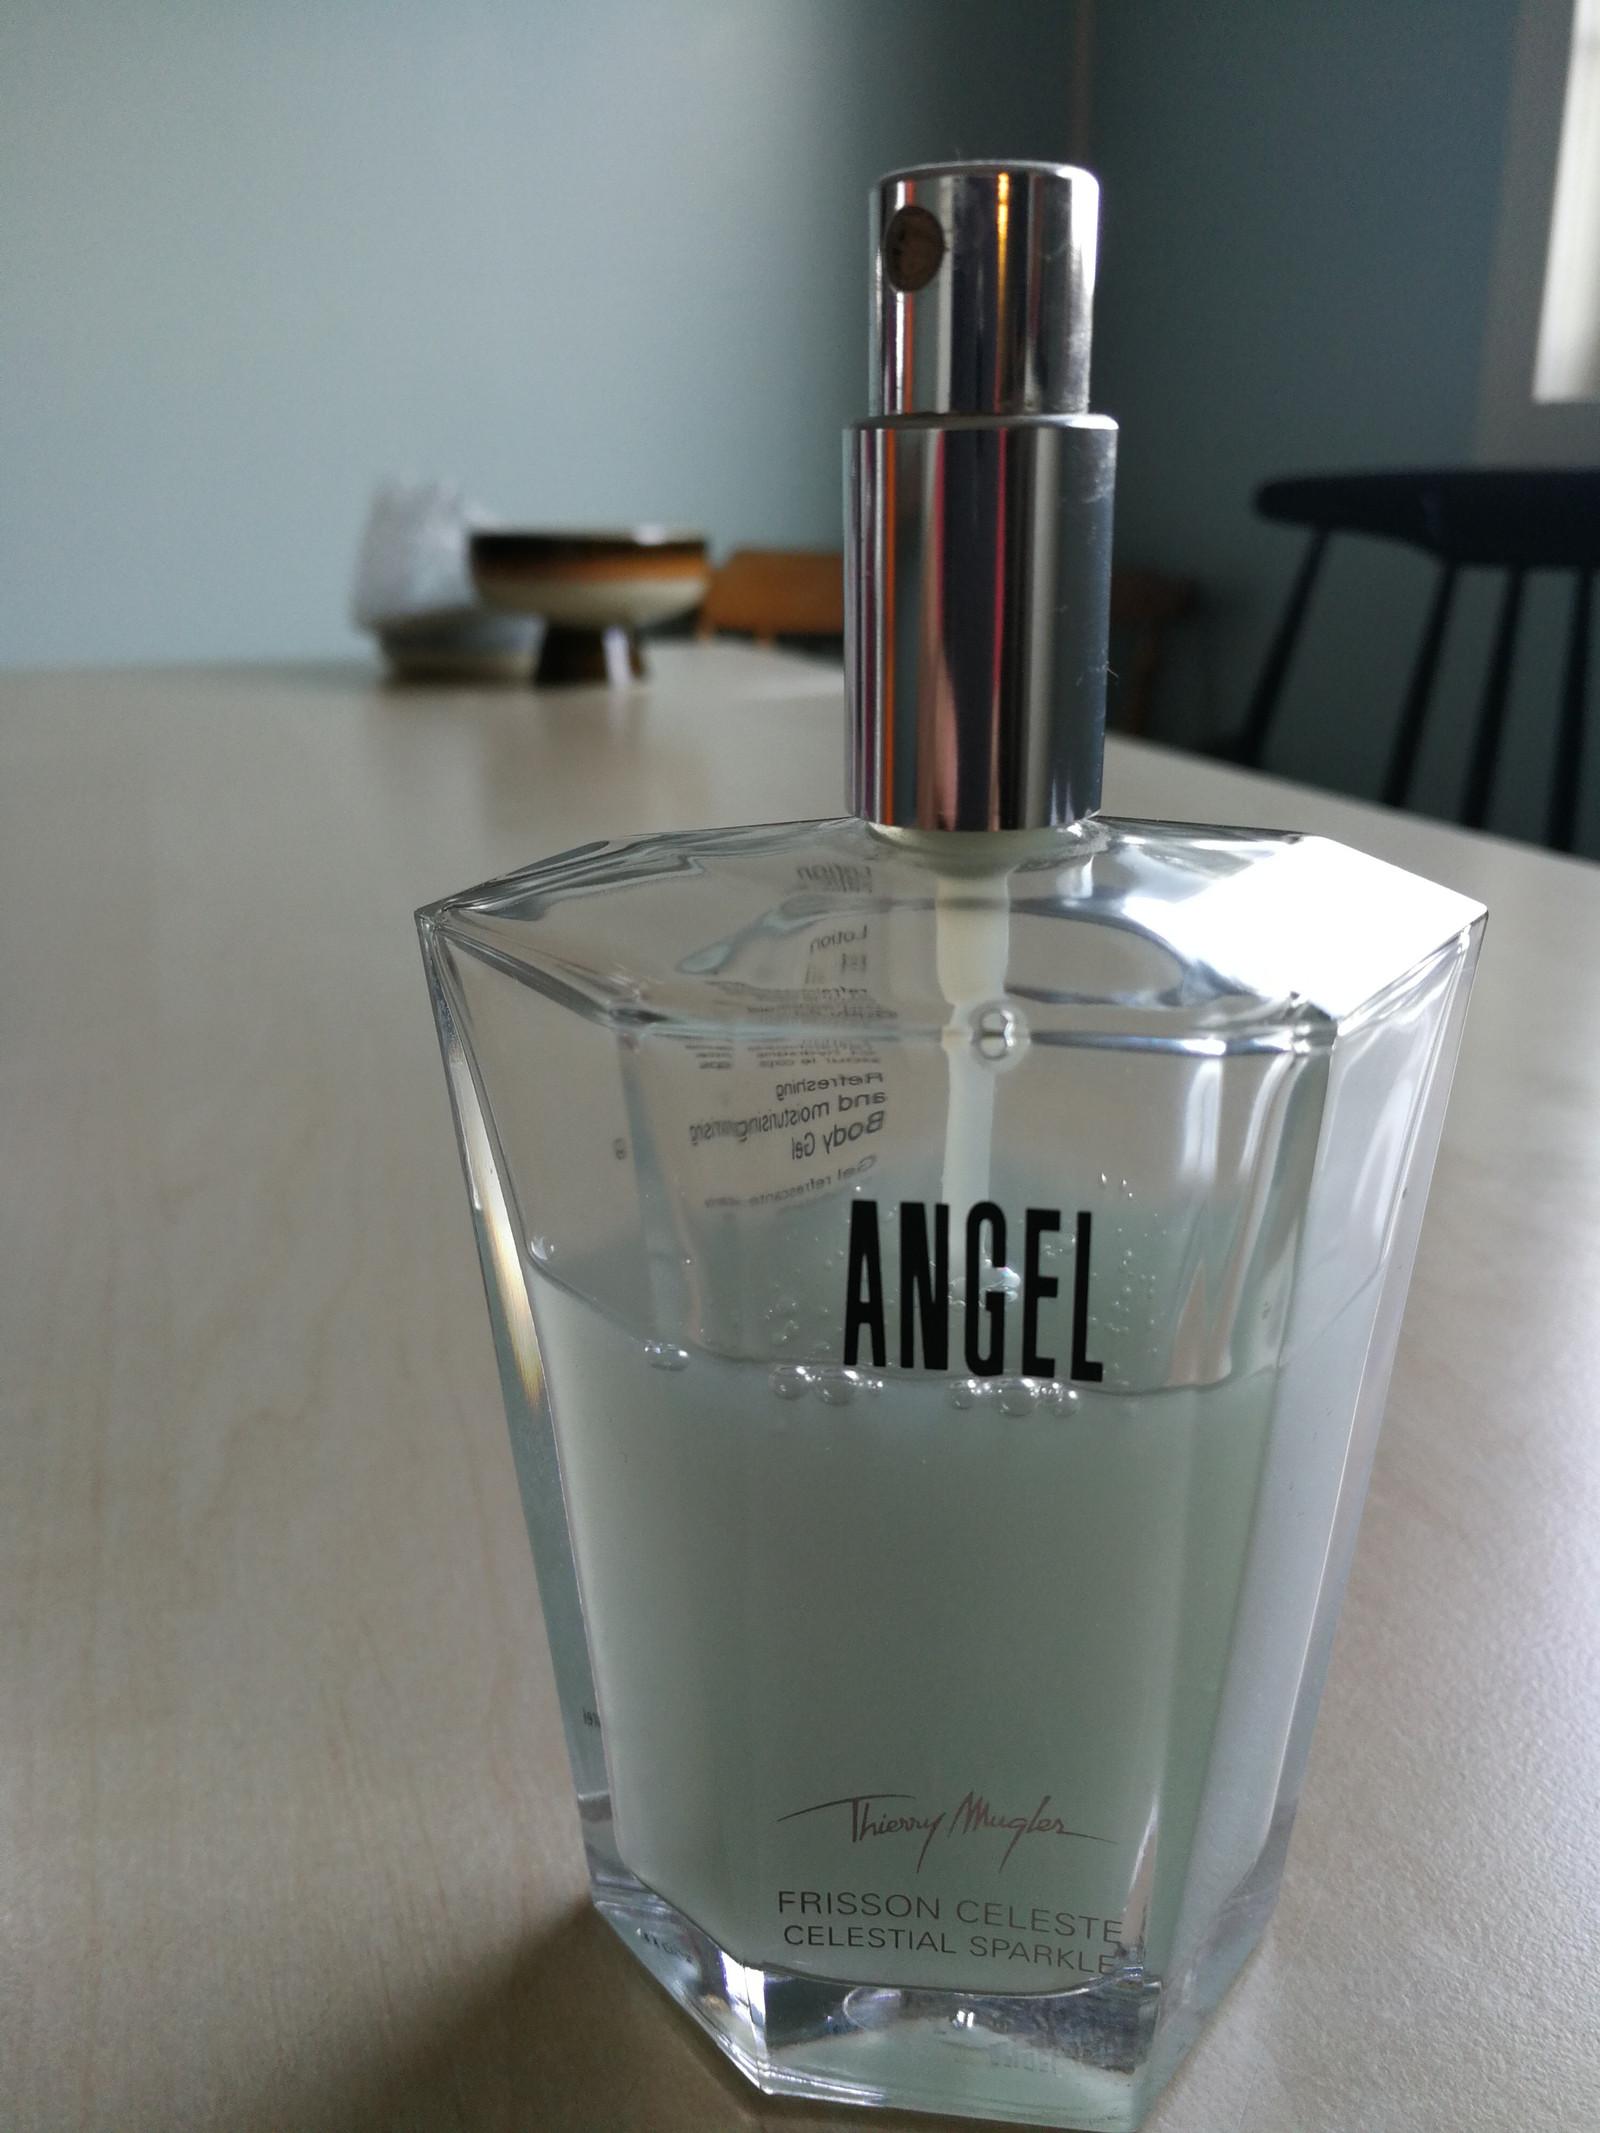 ANGEL FRISSON CELESTE THIERRY MUGLER CELESTIAL SPARKLE | FINN.no